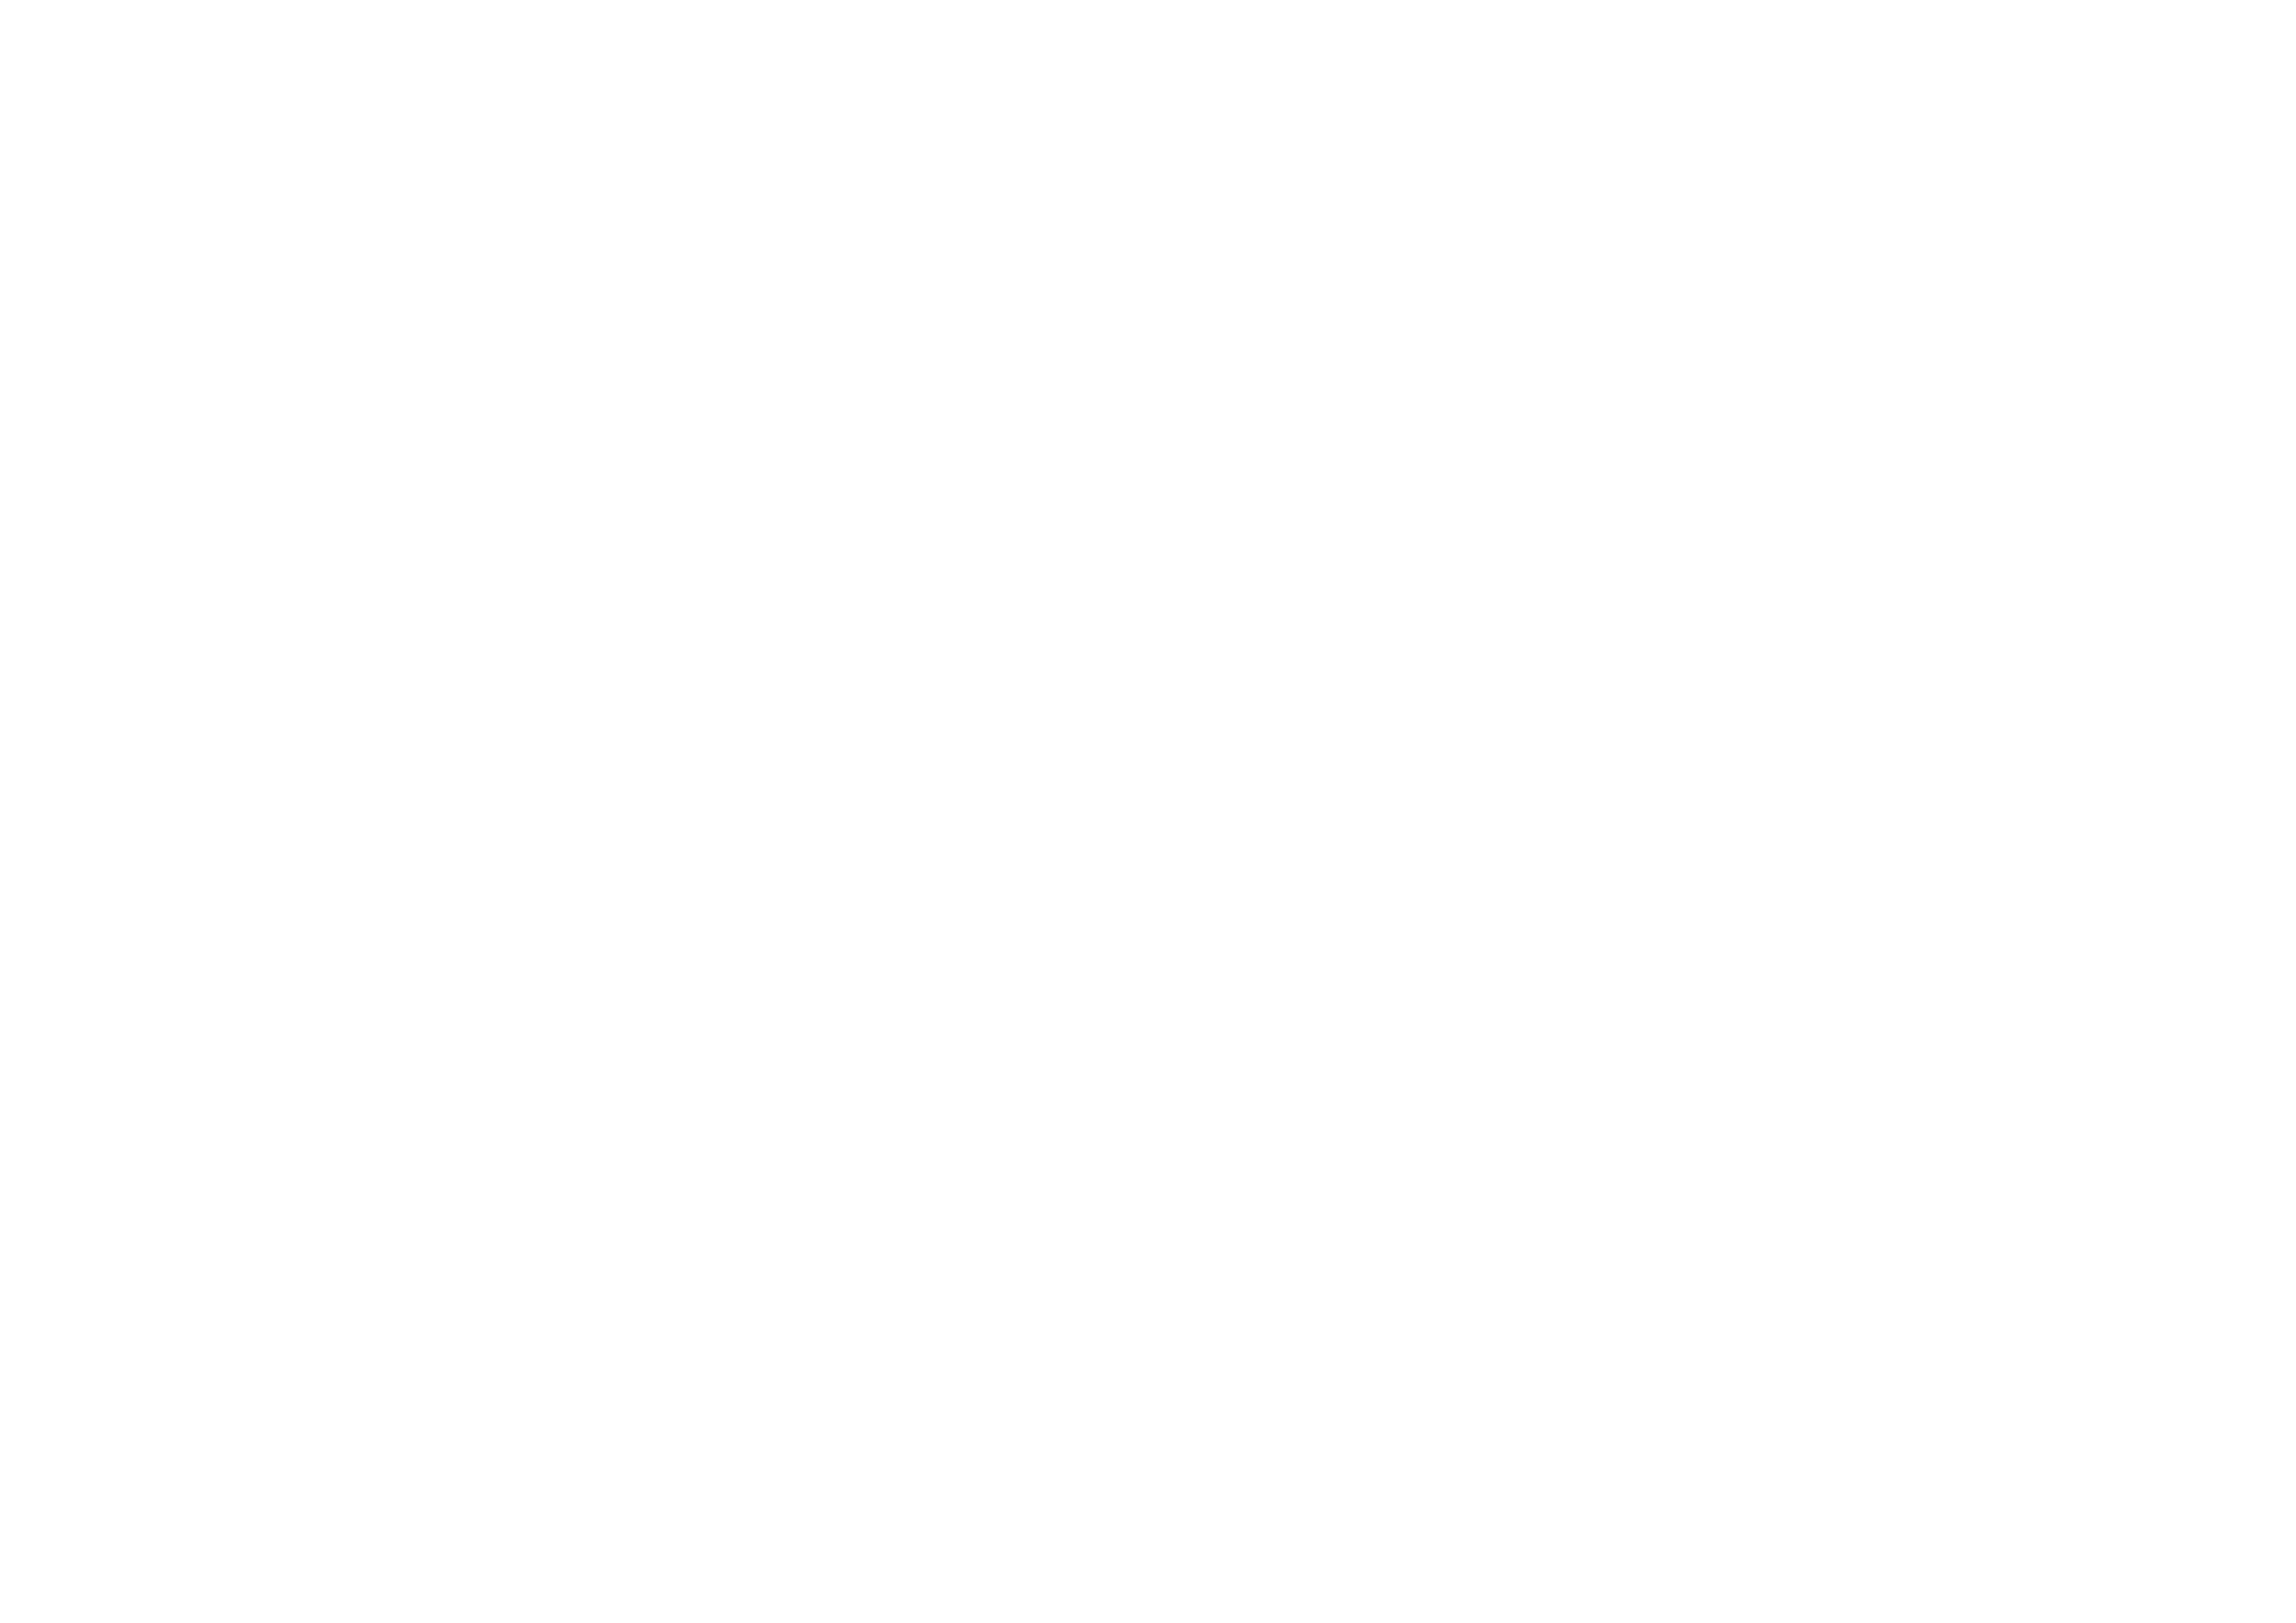 Logo youtube blanco clipart banner transparent YouTube white logo - YUNG Citizen banner transparent